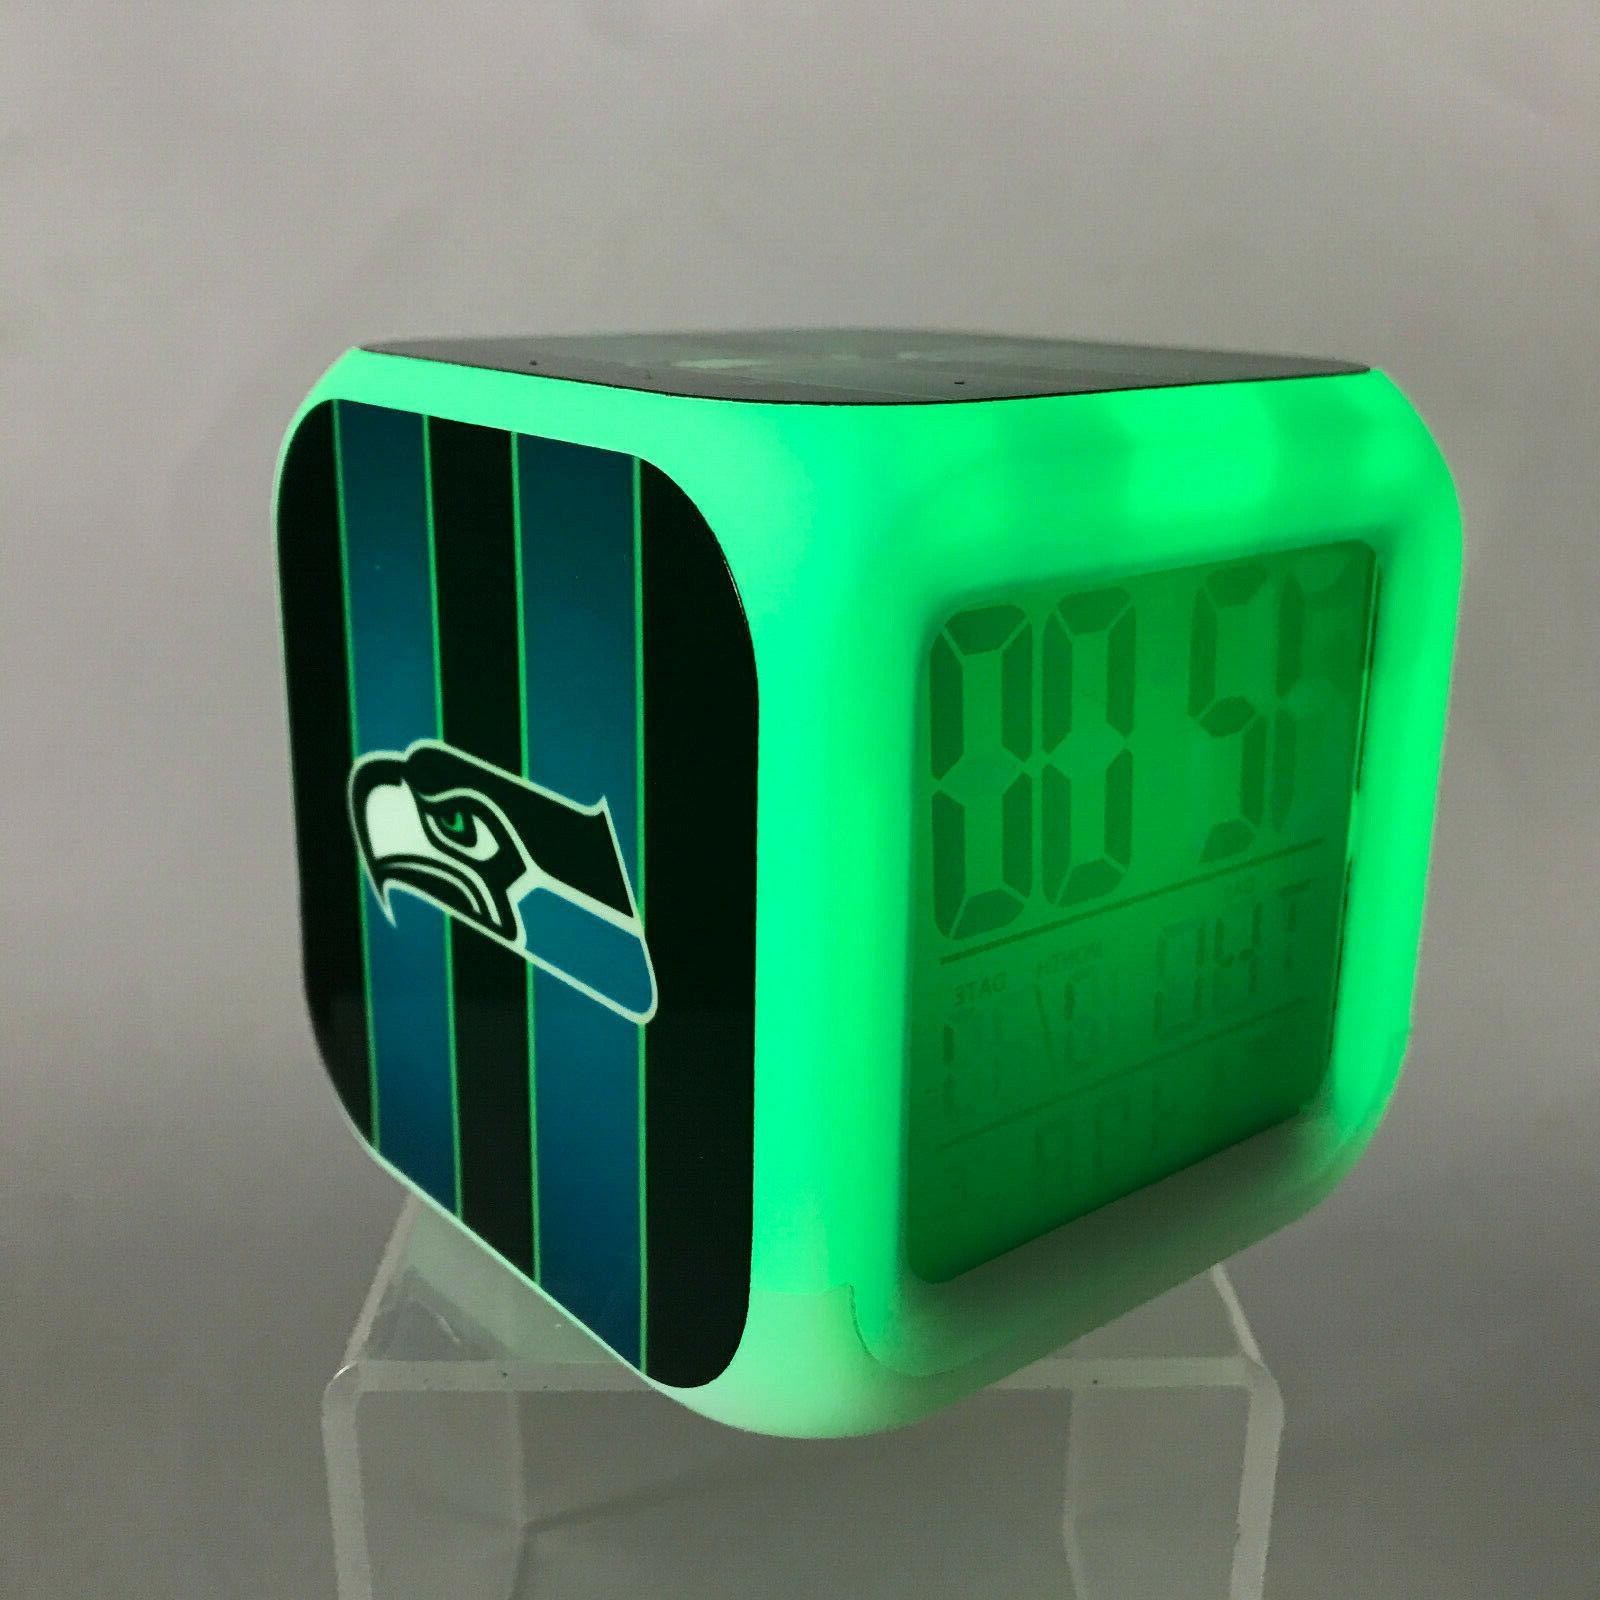 nfl led digital alarm clock watch lamp